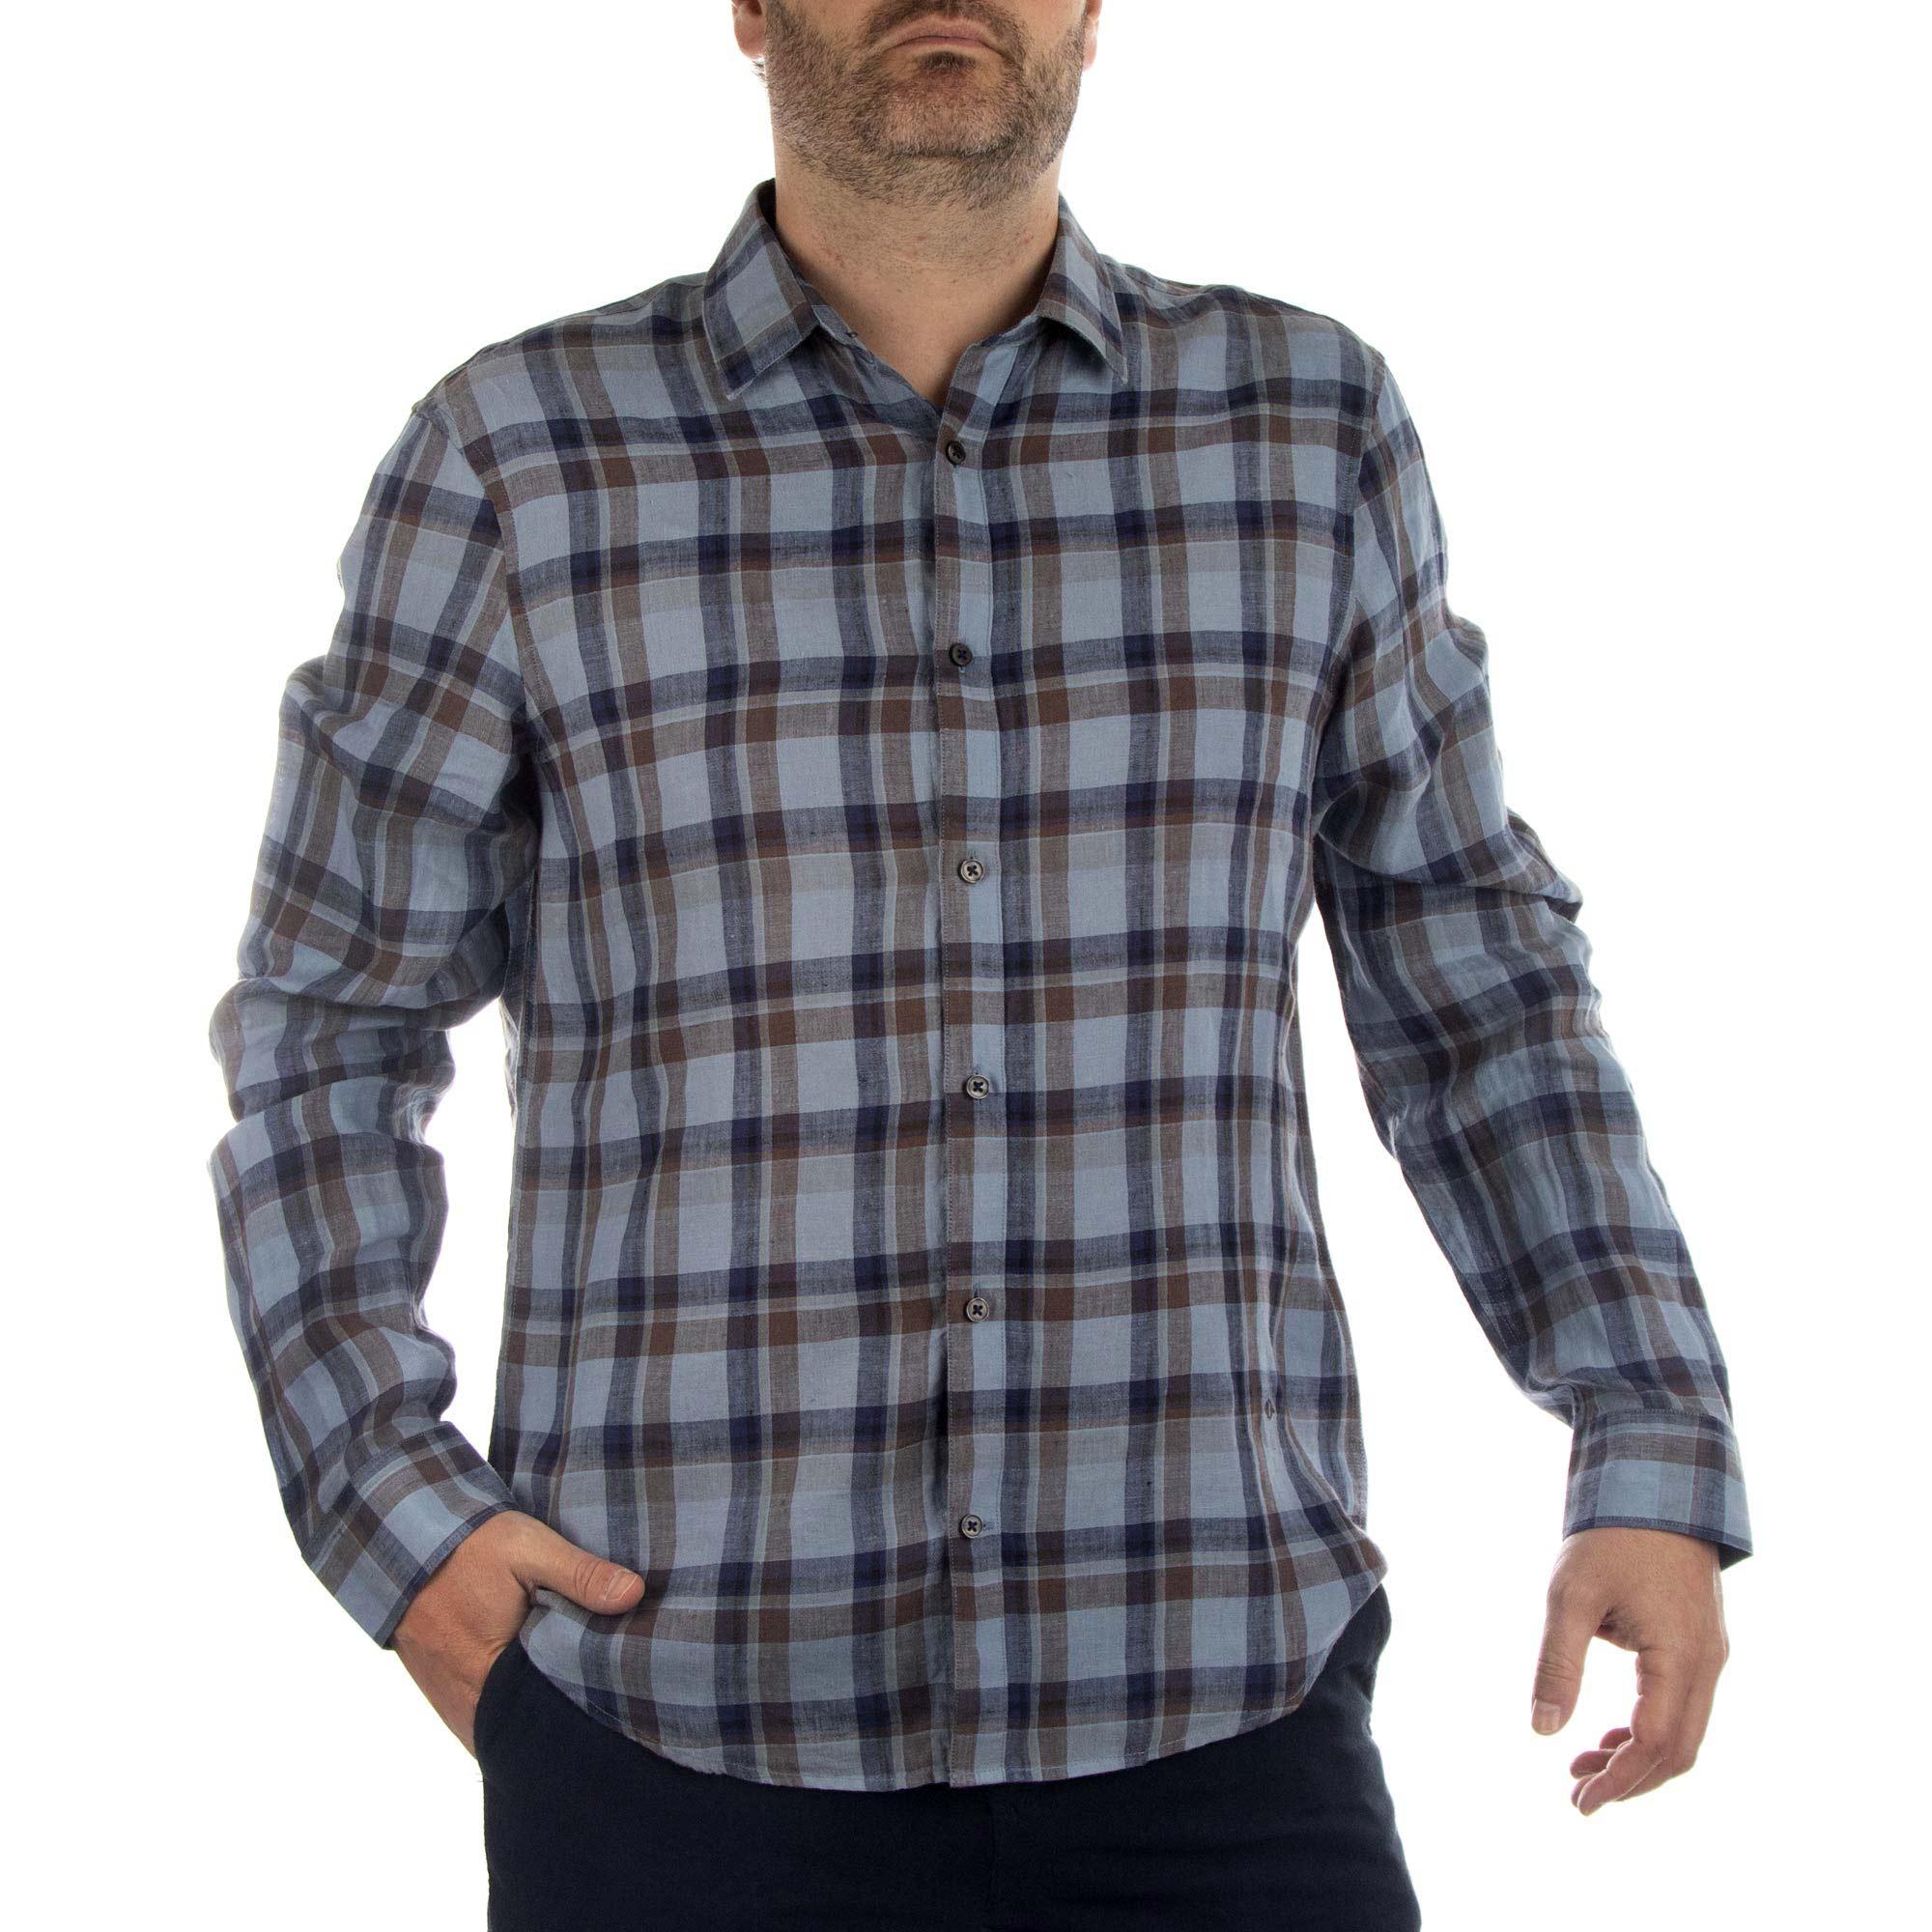 Richards Camisa Linho Xadrez Manga Longa Masculino Azul Claro